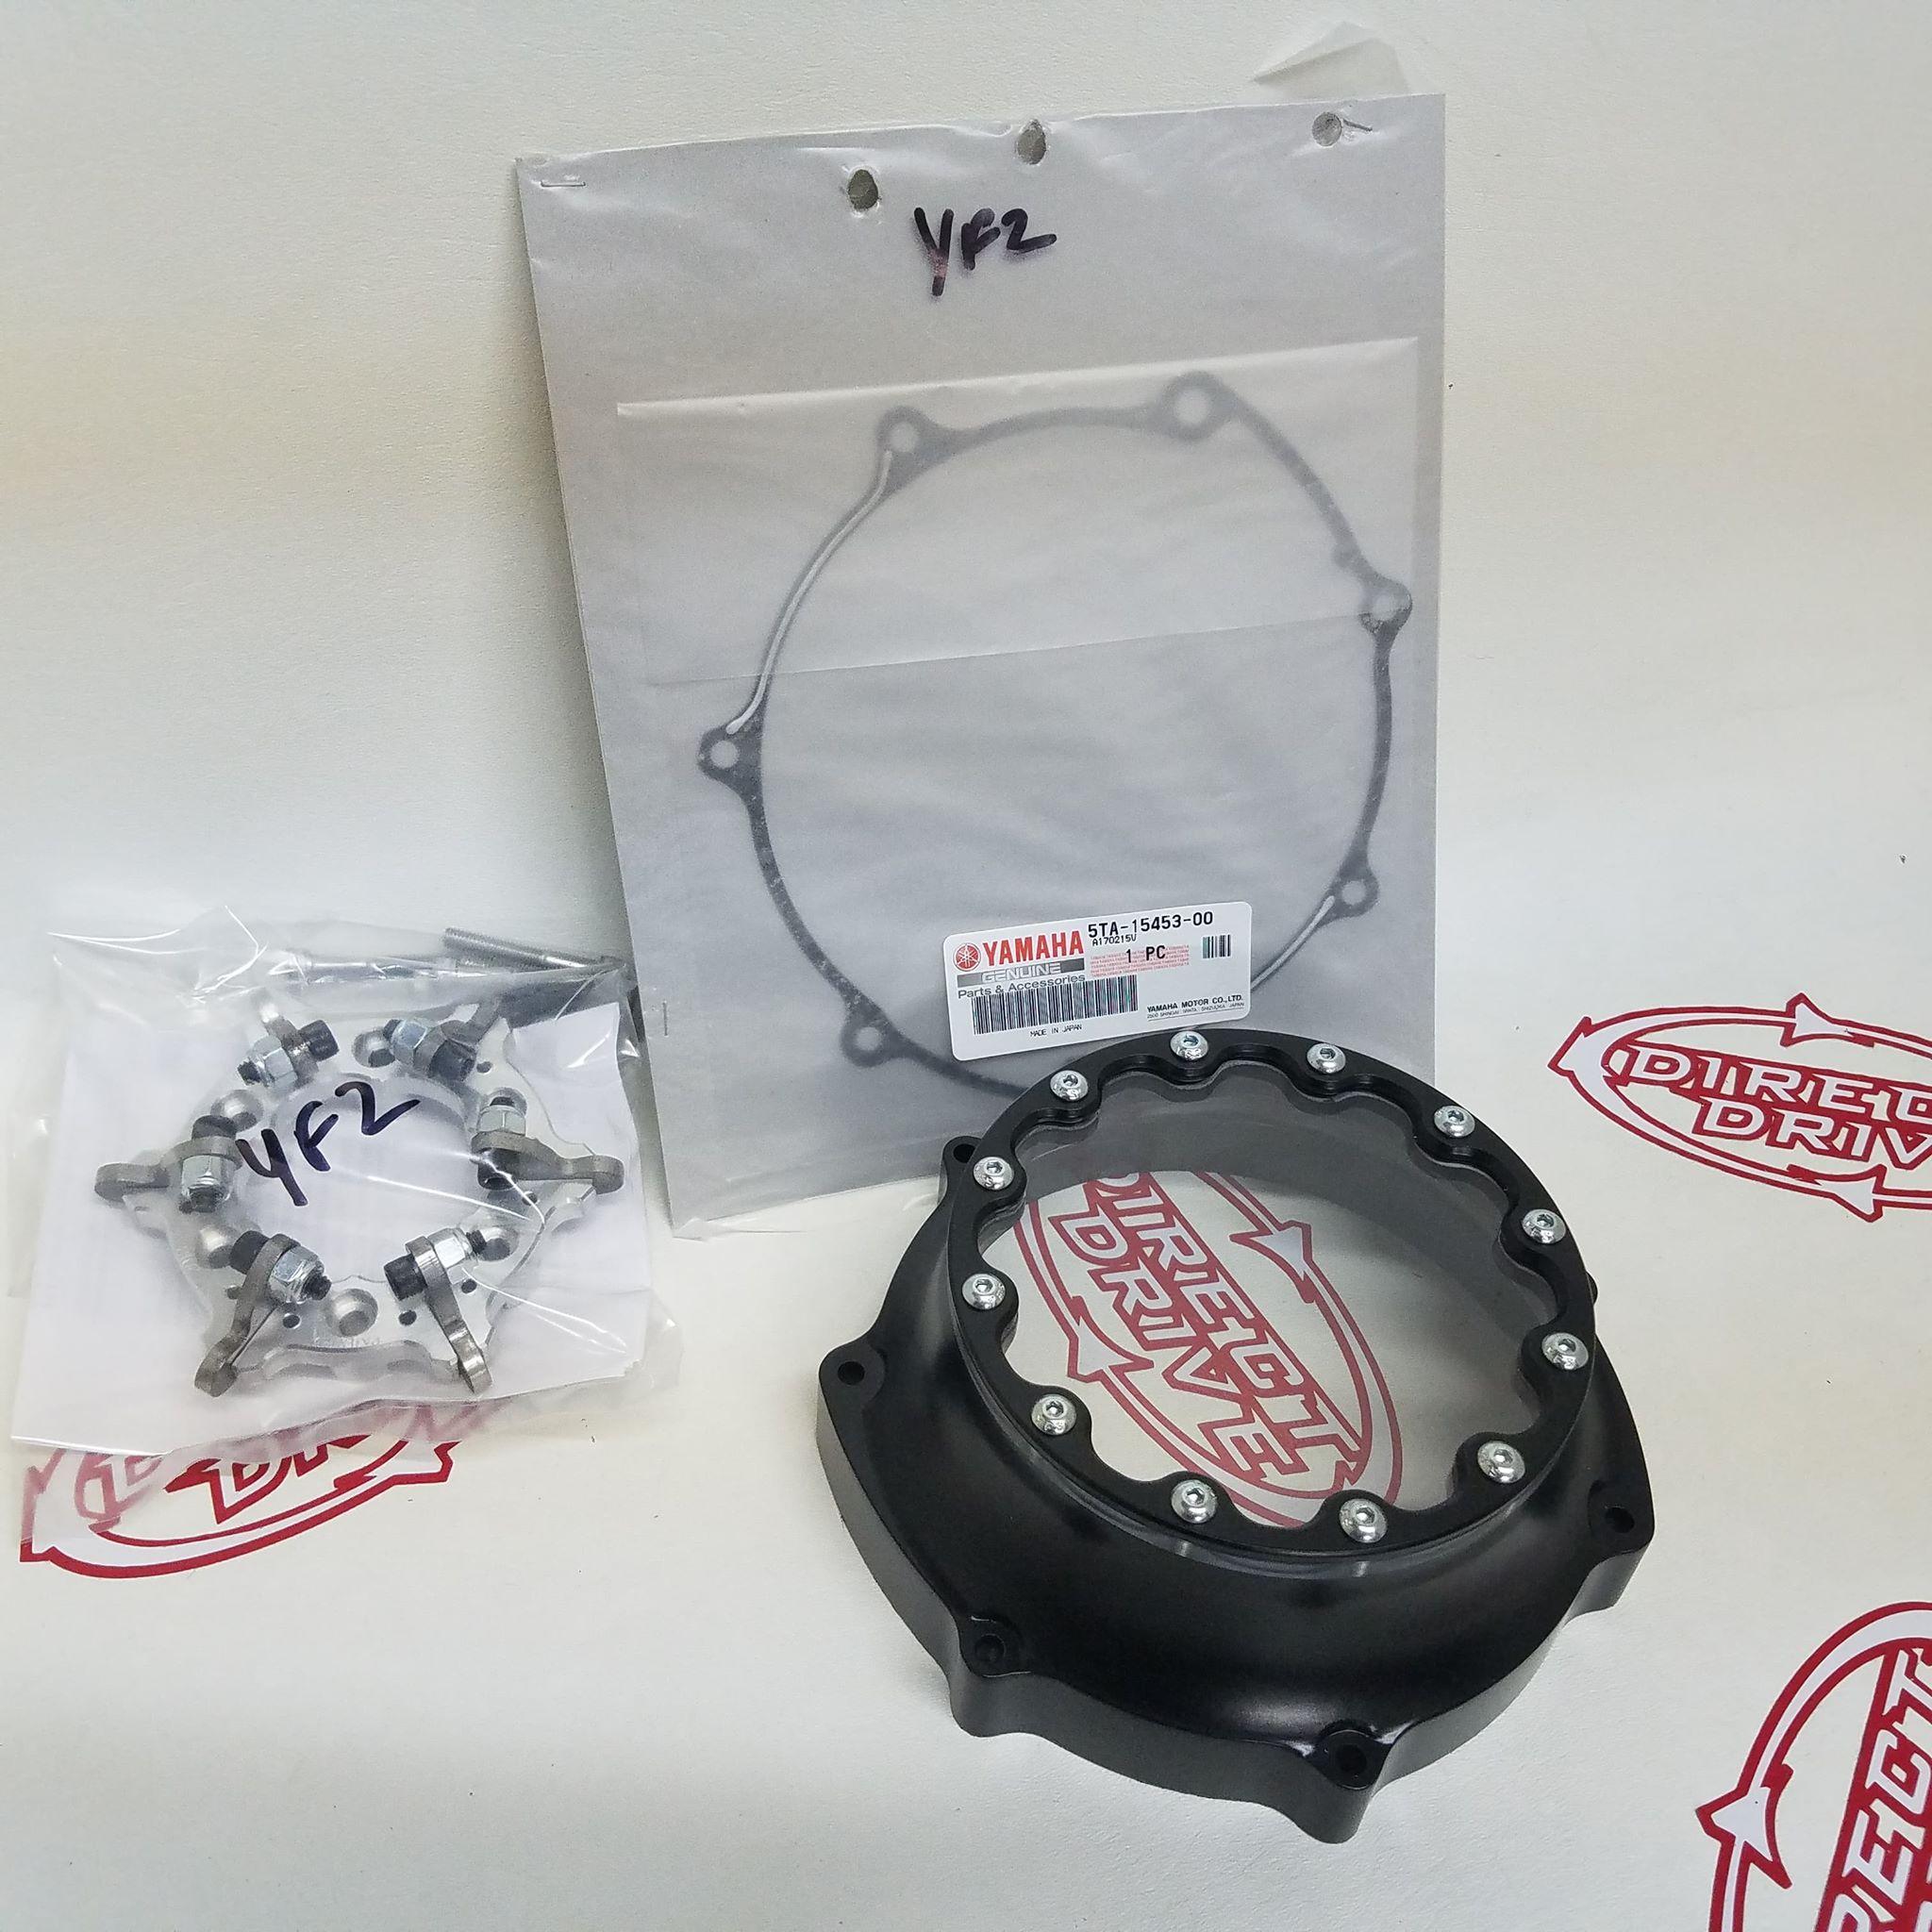 Honda TRX 450 Clutch Cover and Lockout – directdrivecnc net